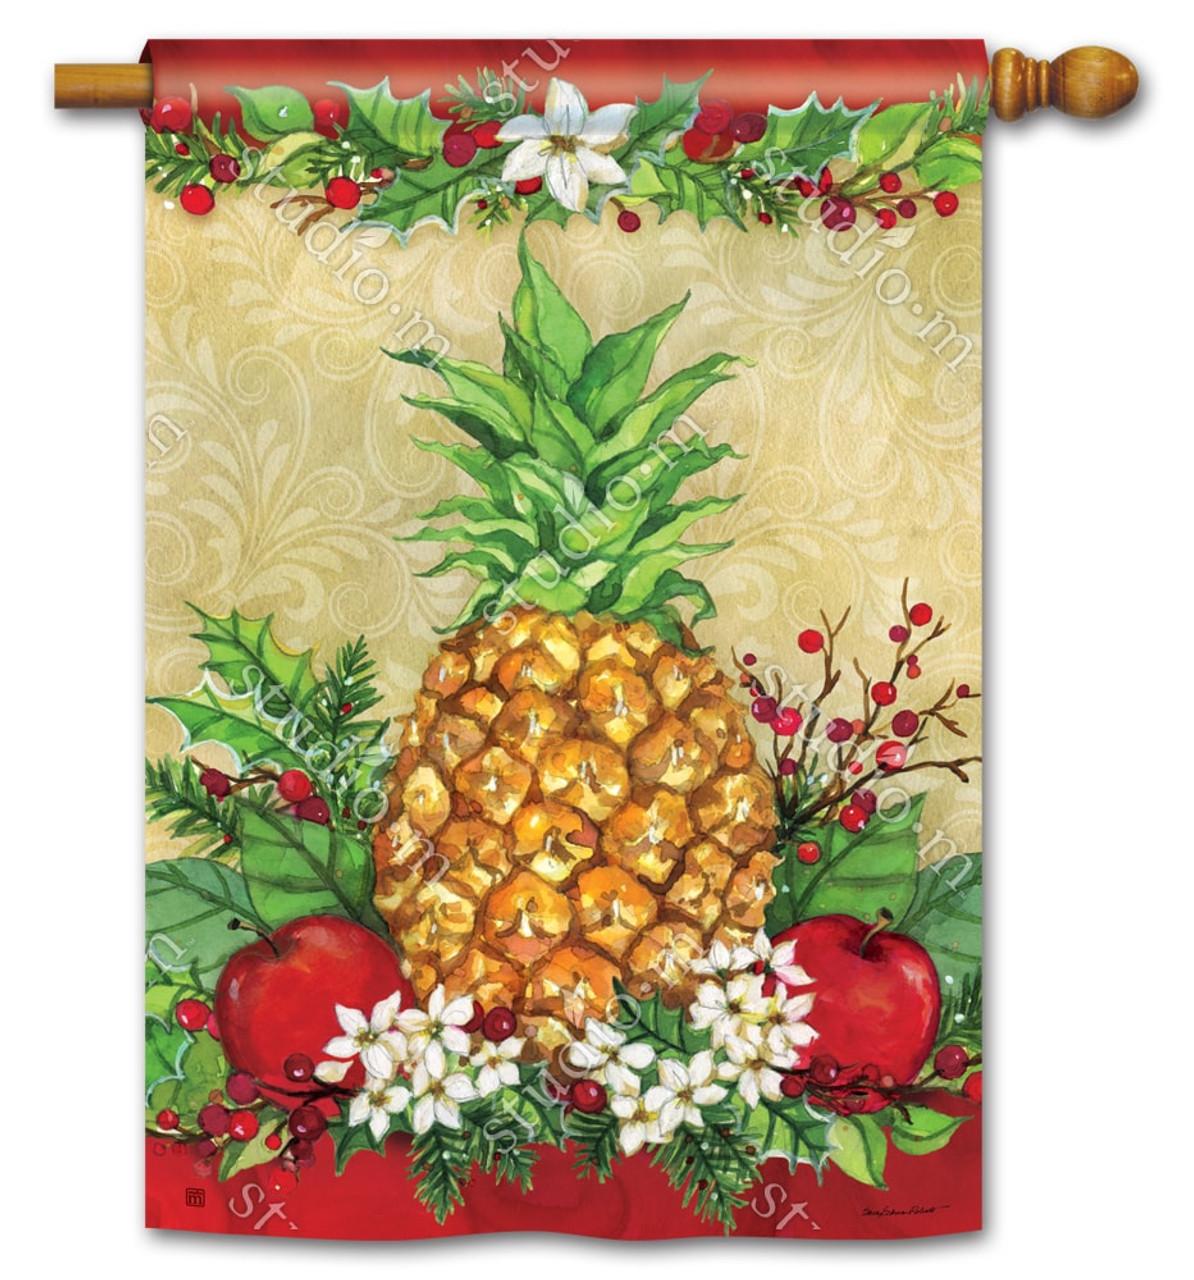 Holiday Pineapple House Flag - Christmas BreezeArt Flags